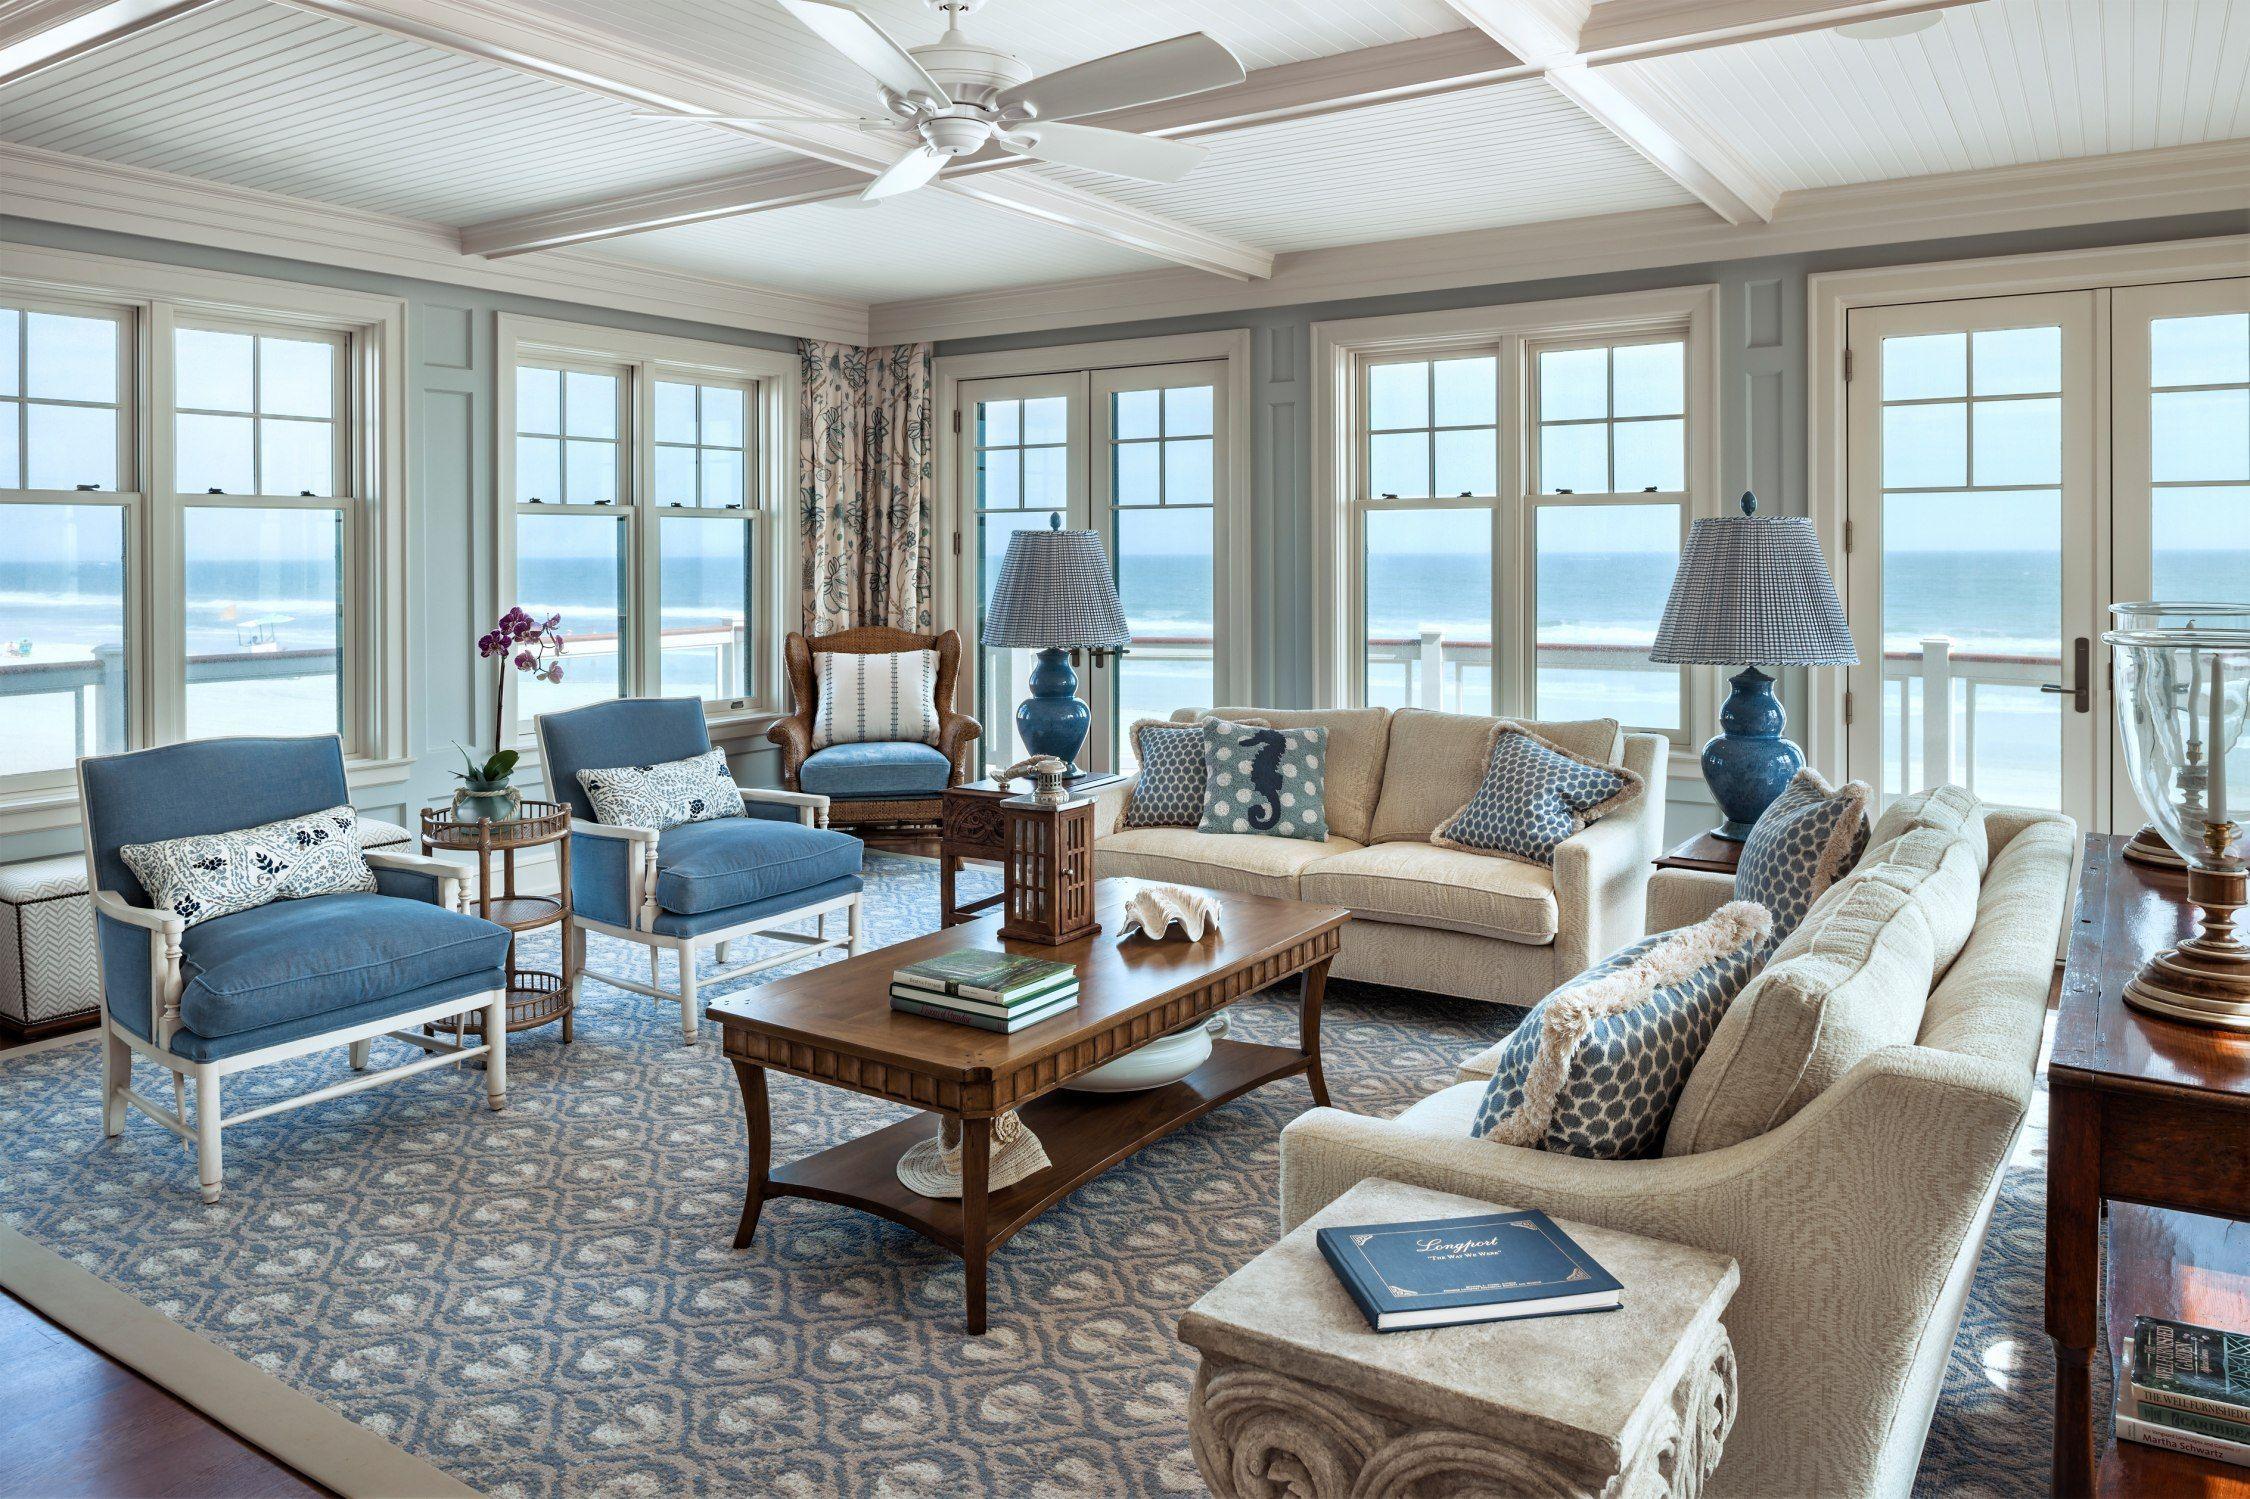 Shingle Style Beach House ~ Eberlein Design Consultants Ltd #Coastaldecoratingapartment